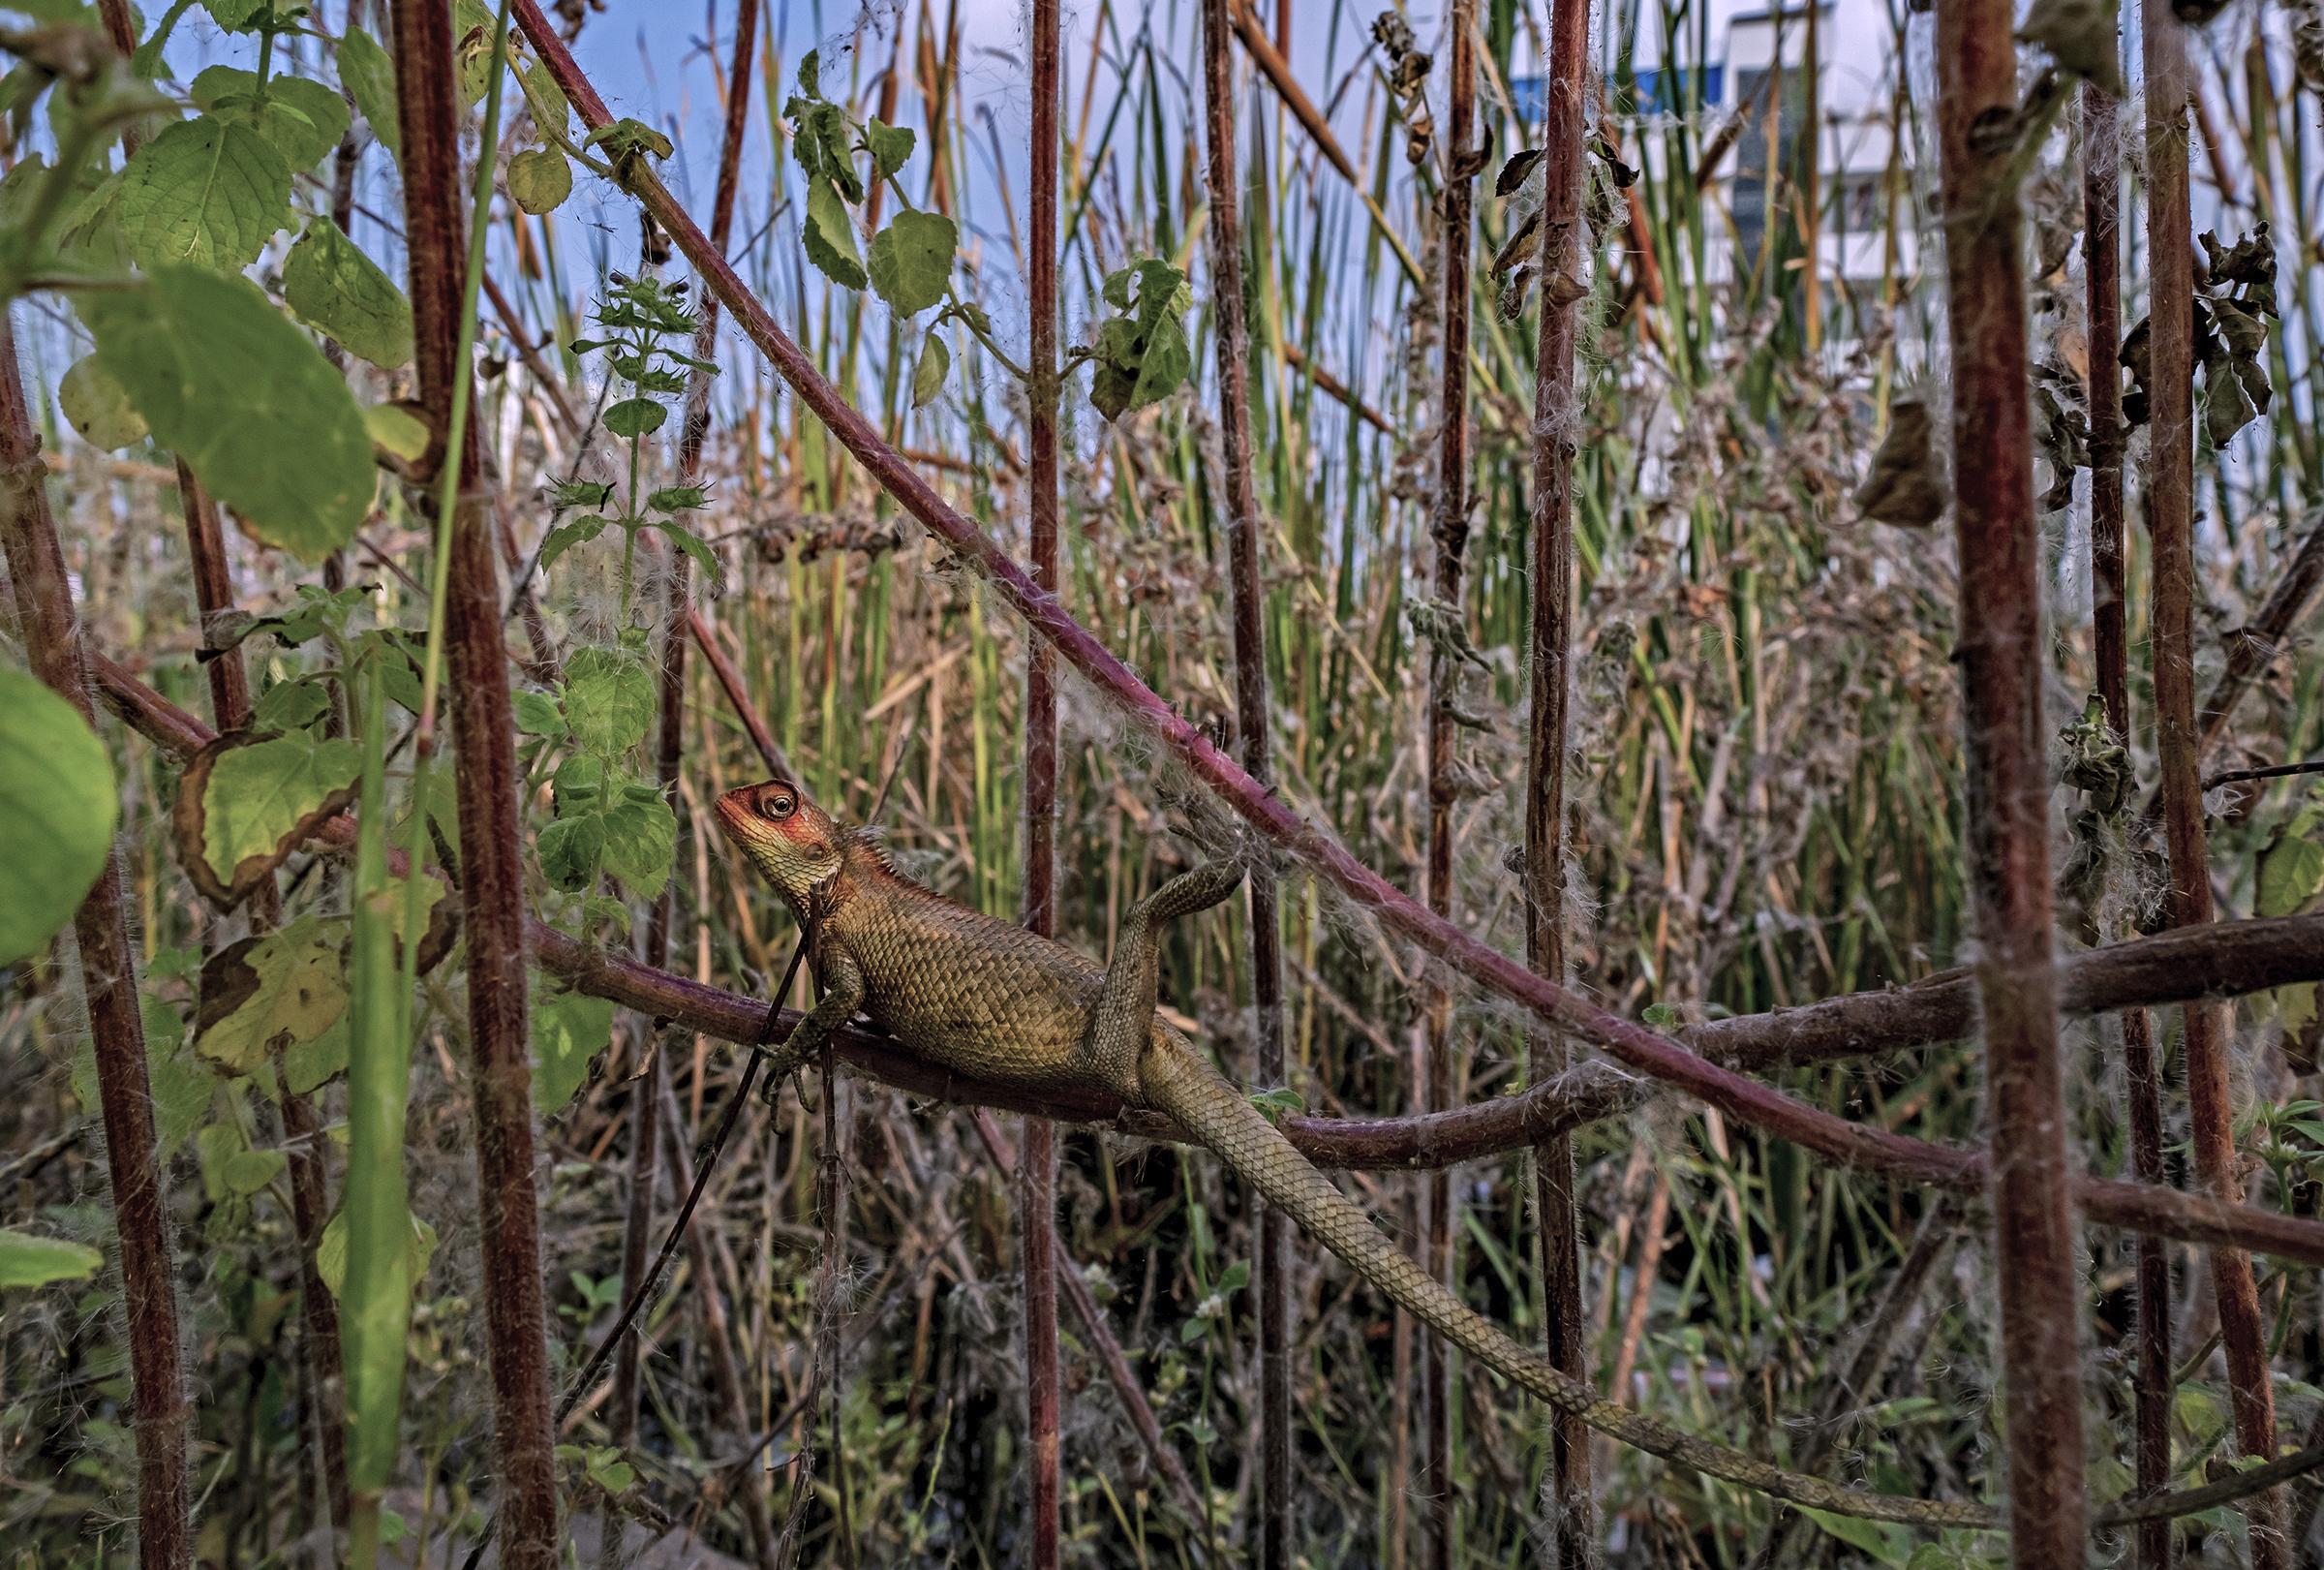 An Oriental garden lizard hunkers down in the vegetation at the edge of Pallikaranai Marsh.